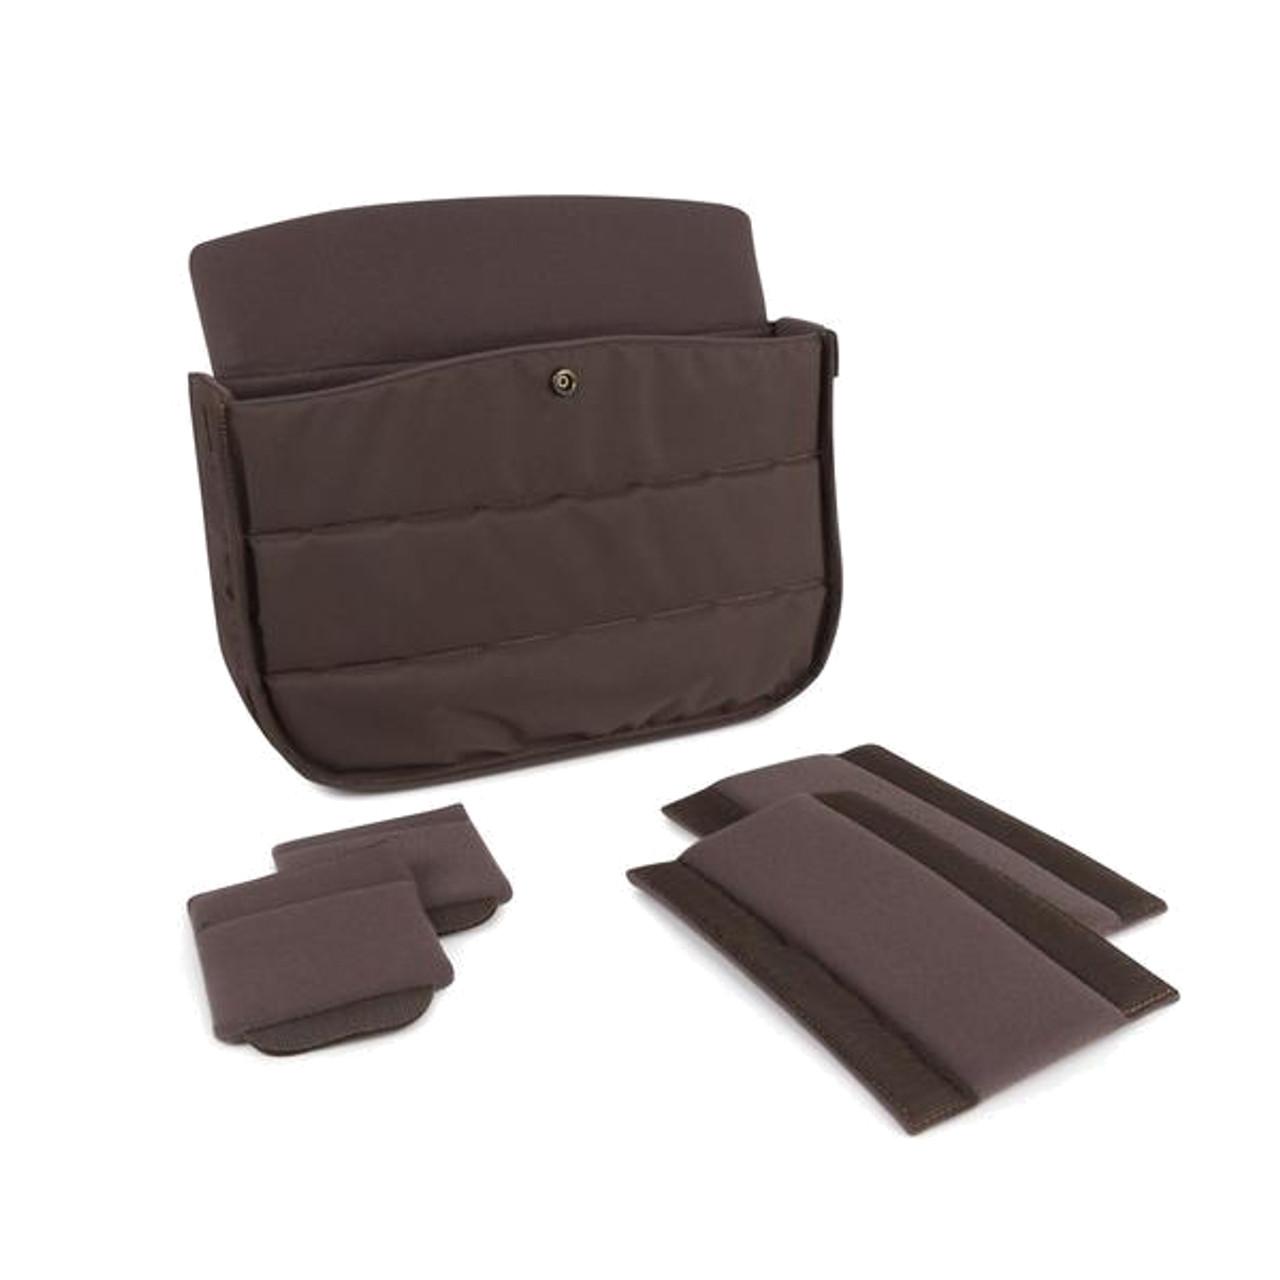 Billingham Hadley Pro 2020 Navy Canvas/Chocolate Leather